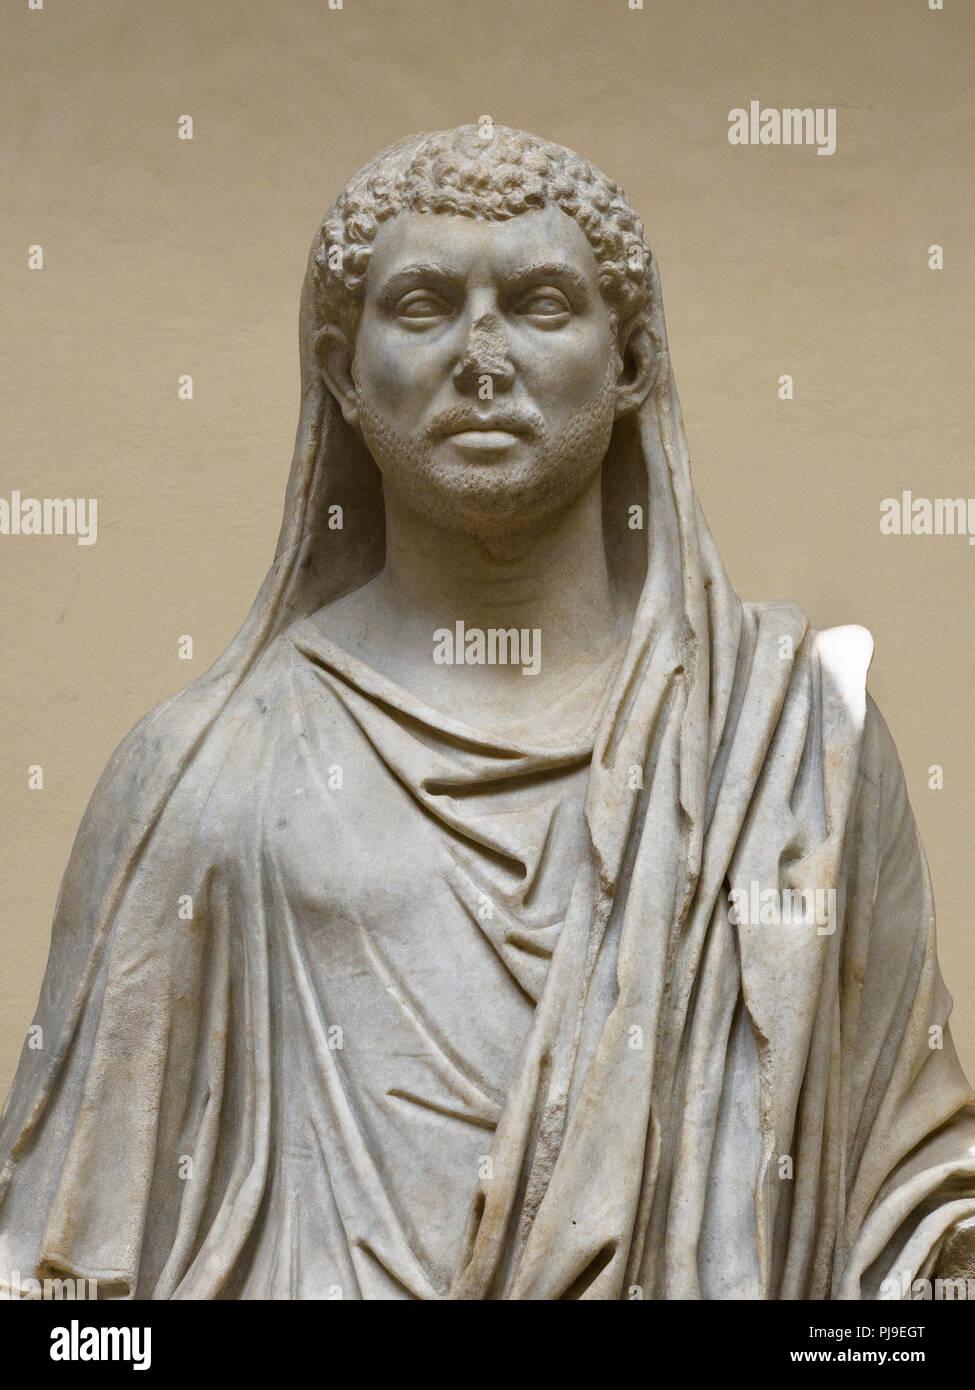 Rome. Italy. Portrait Statue of Roman emperor Maxentius, 4th century A.D. Museo Archeologico Ostiense, Ostia Antica. - Stock Image